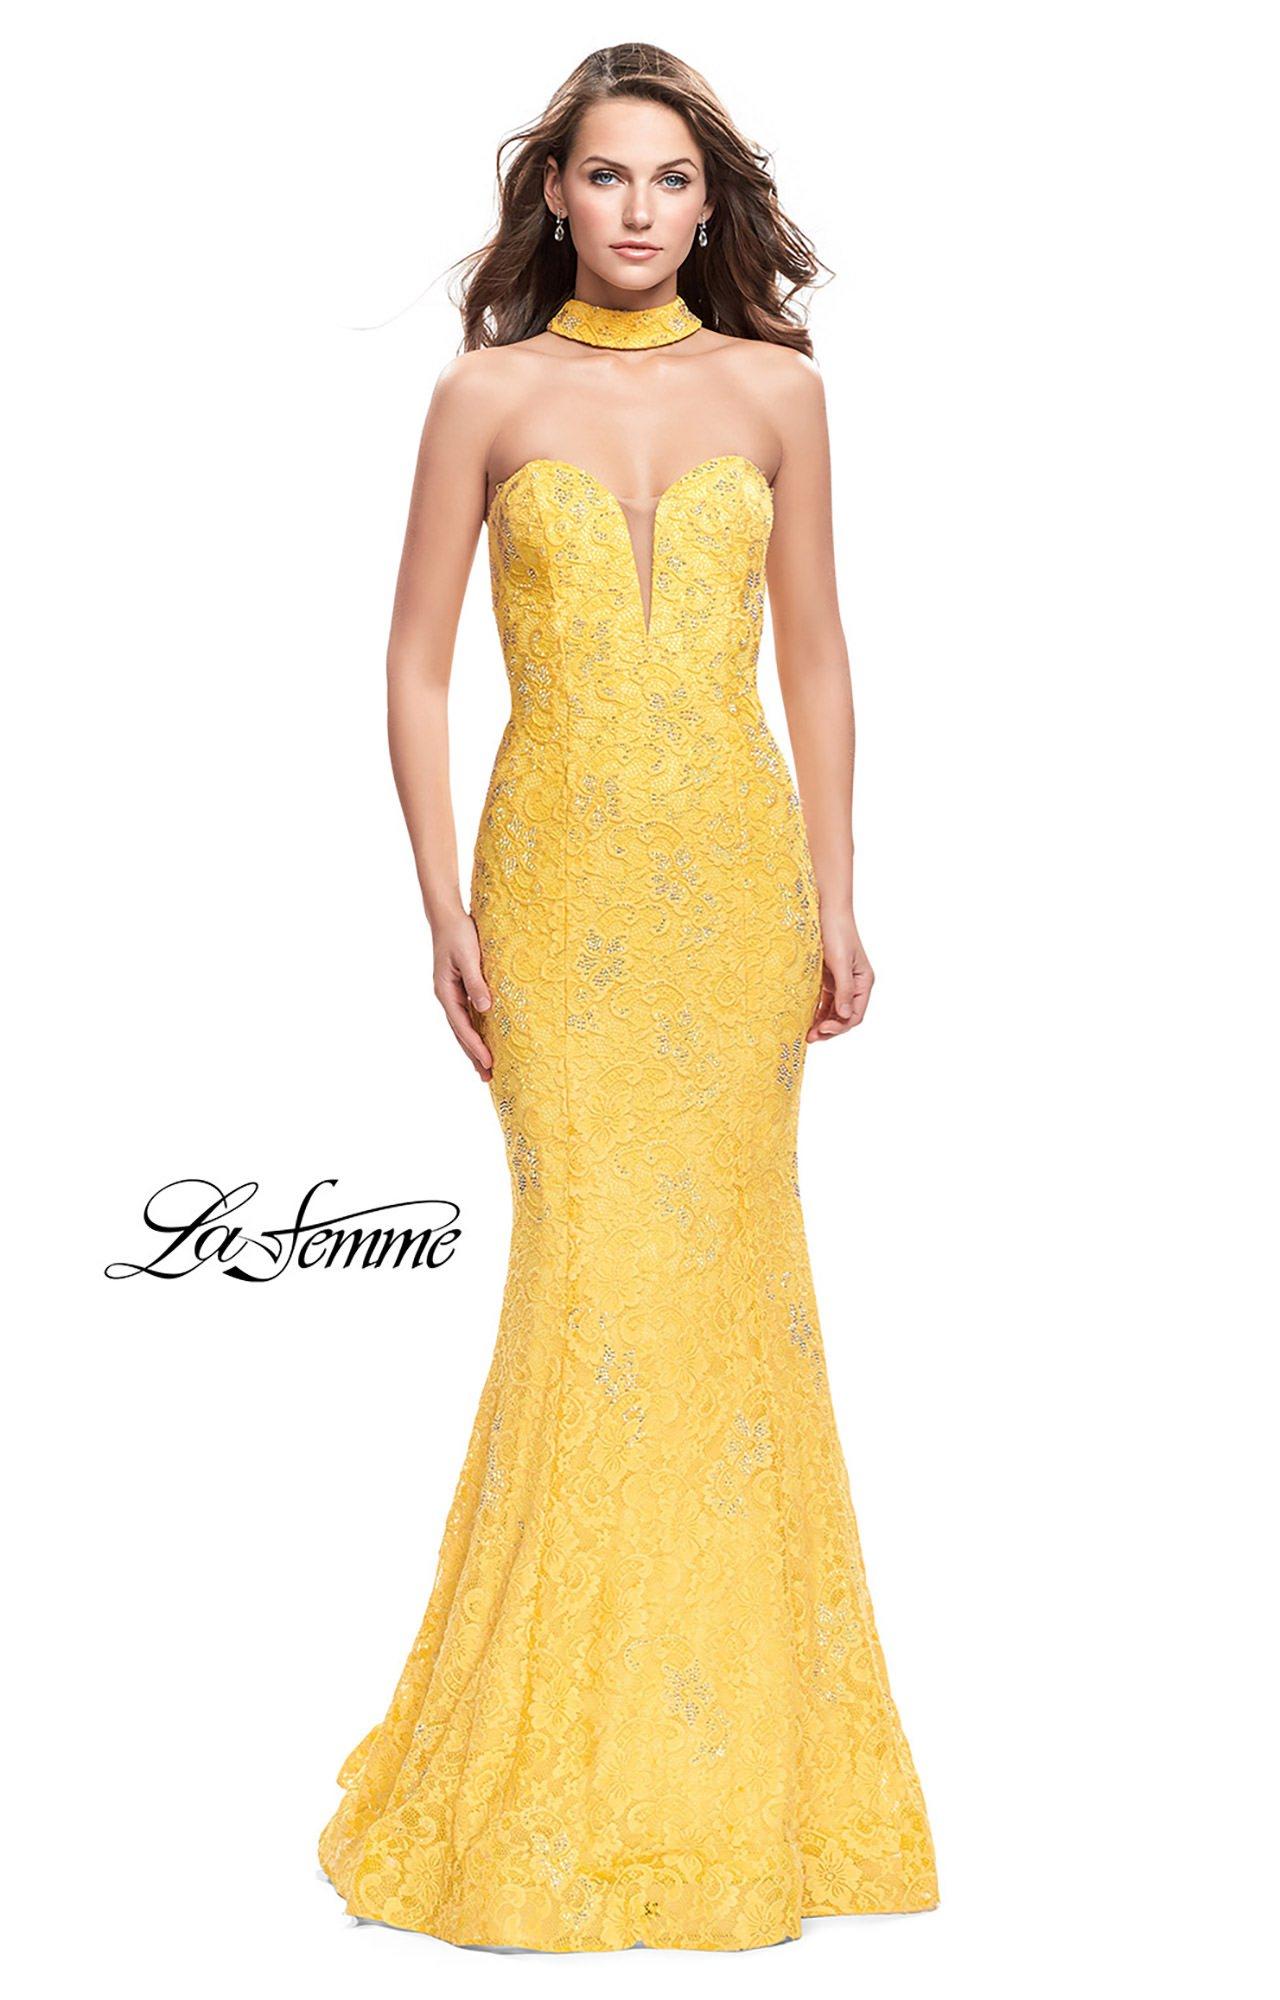 La Femme 26261 - Long Strapless Lace Choker Prom Dress